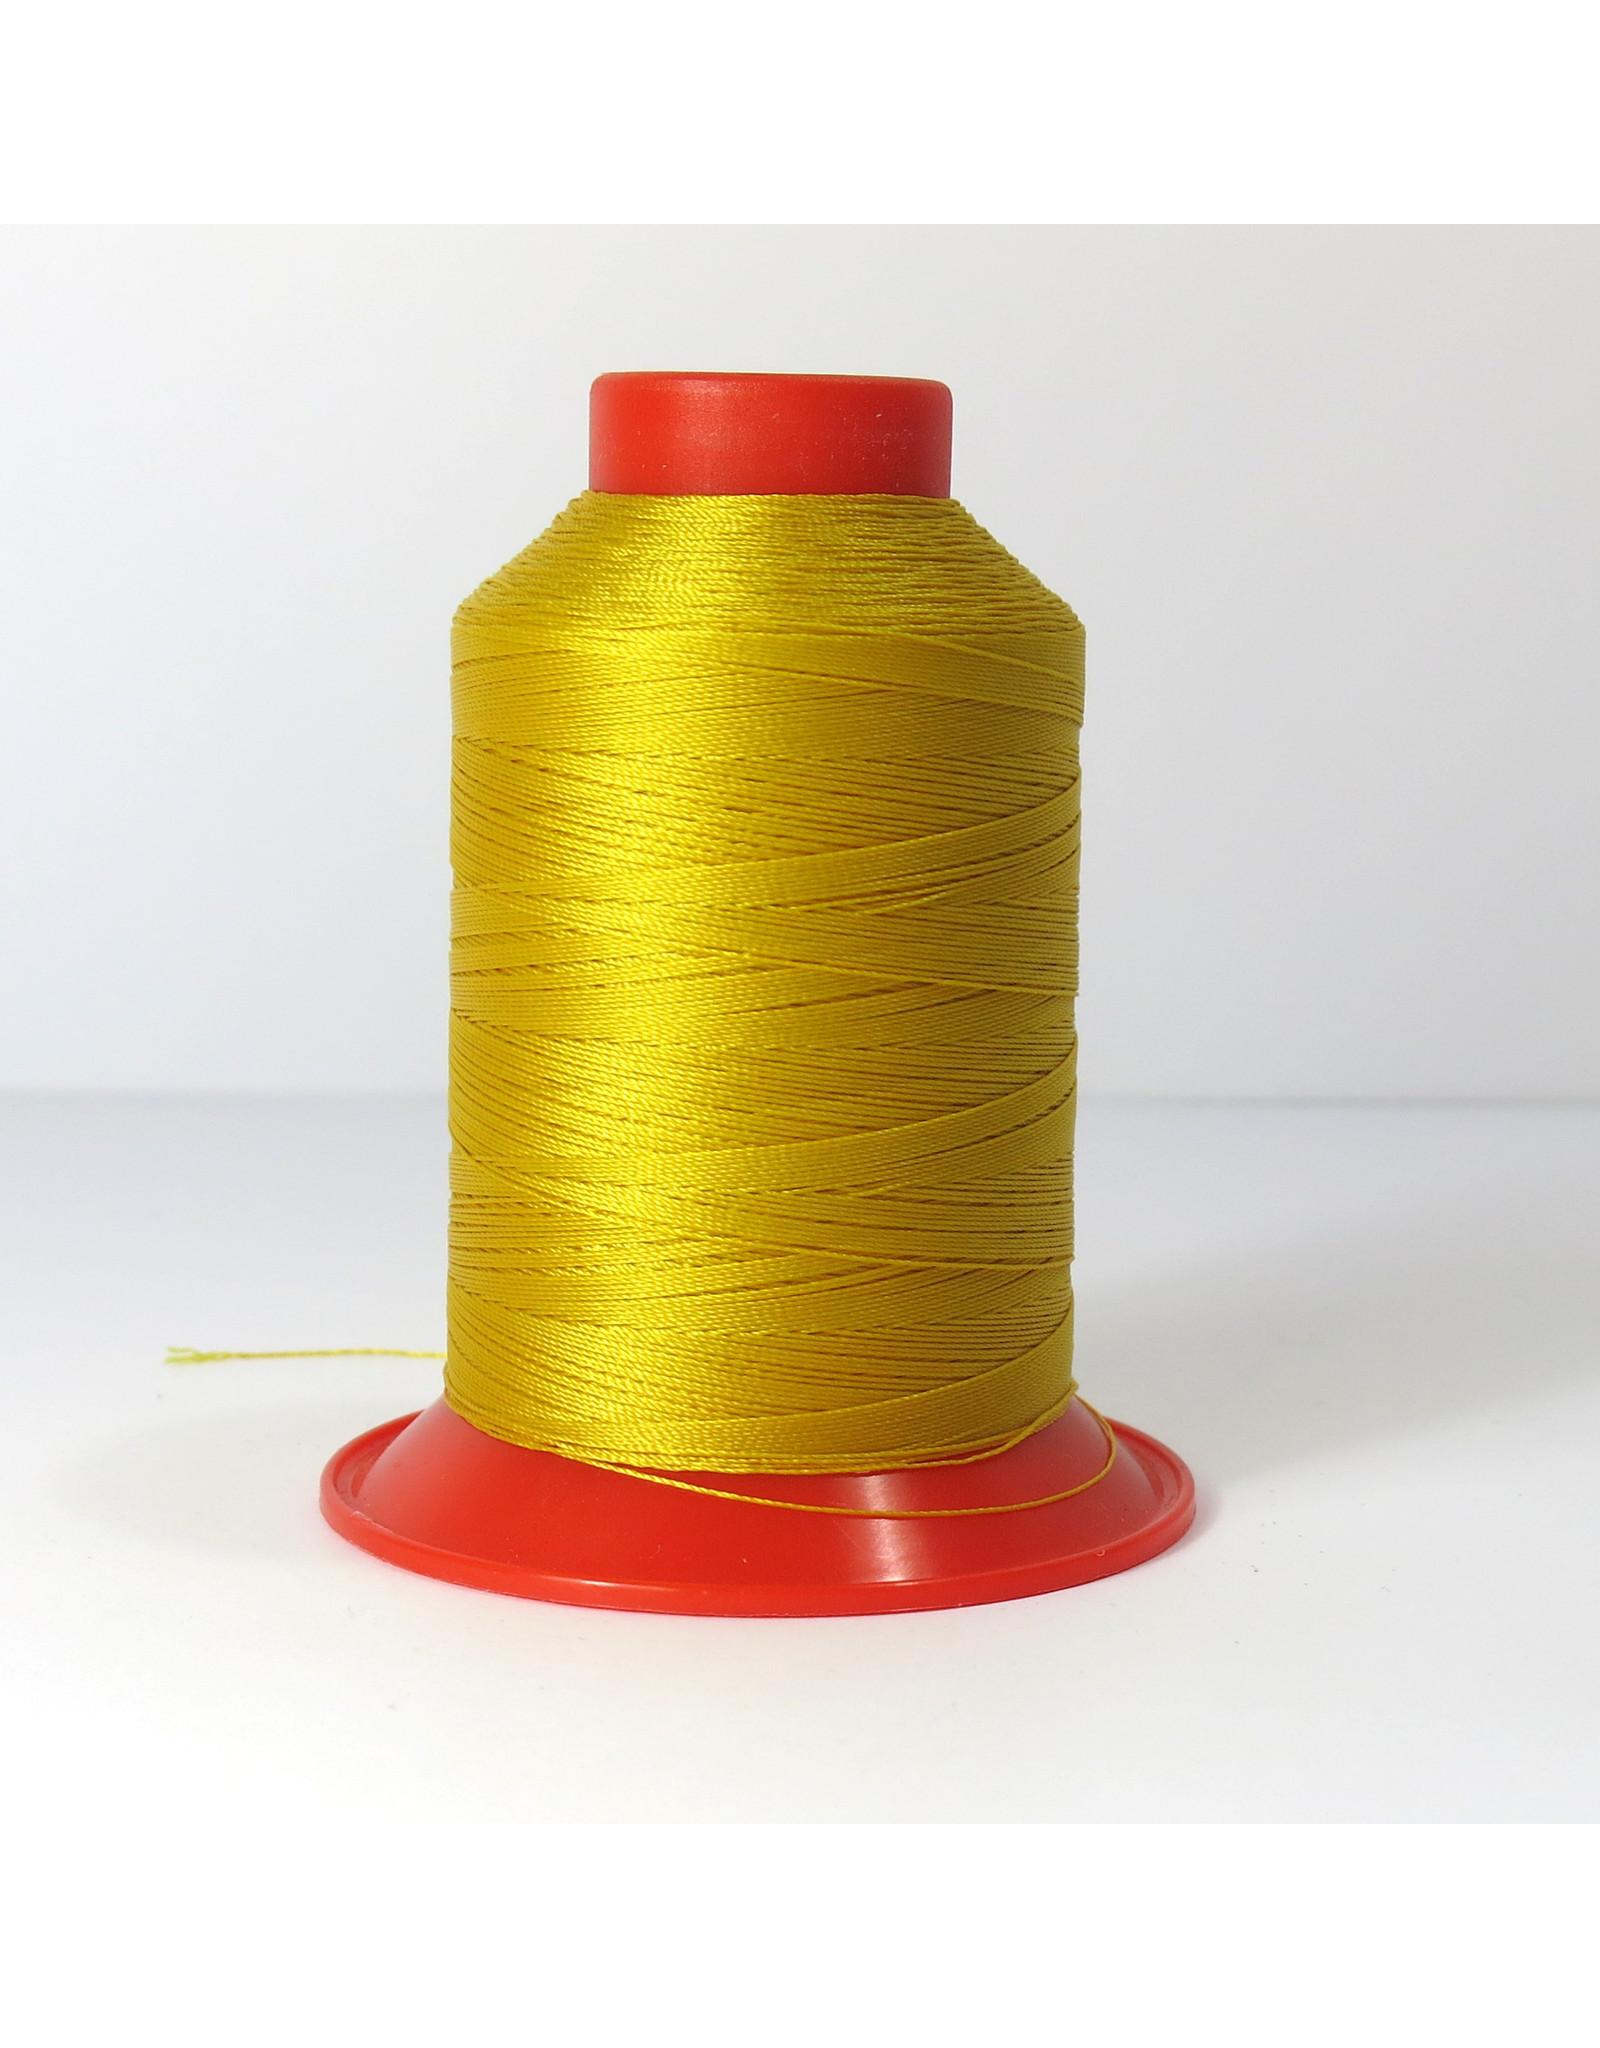 Serafil machine sewing threads 0118